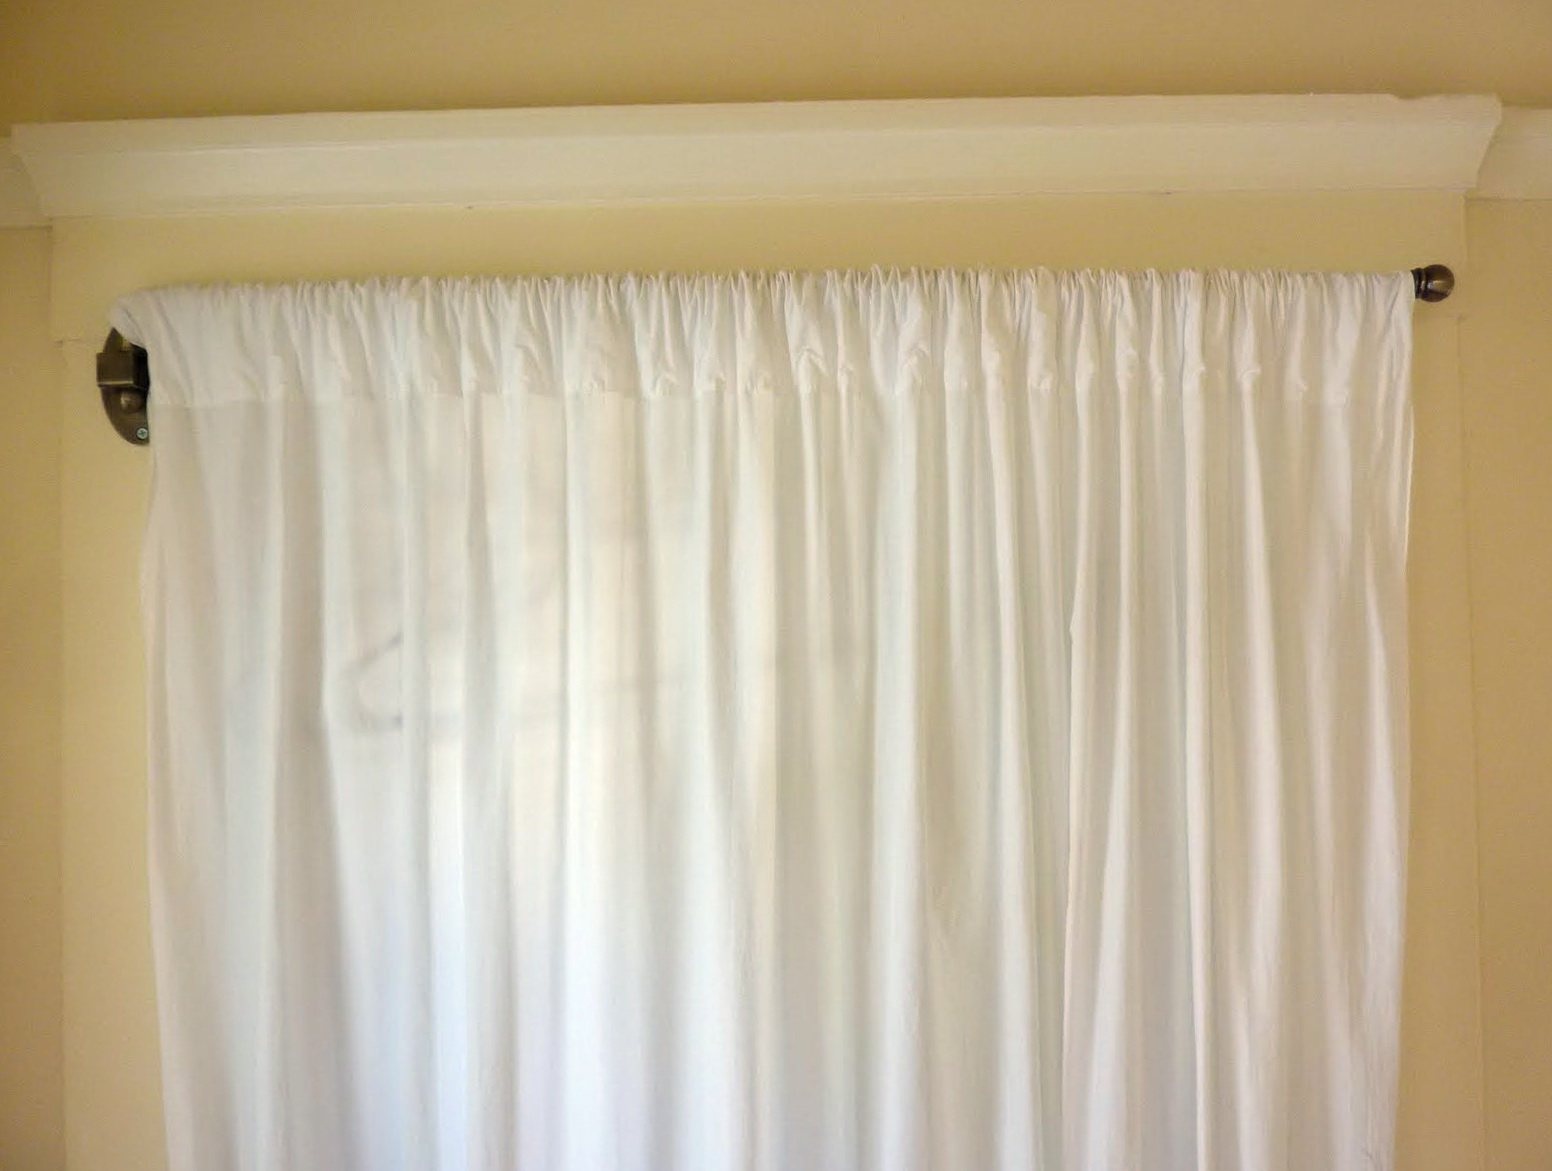 Umbra Curtain Rod Hardware